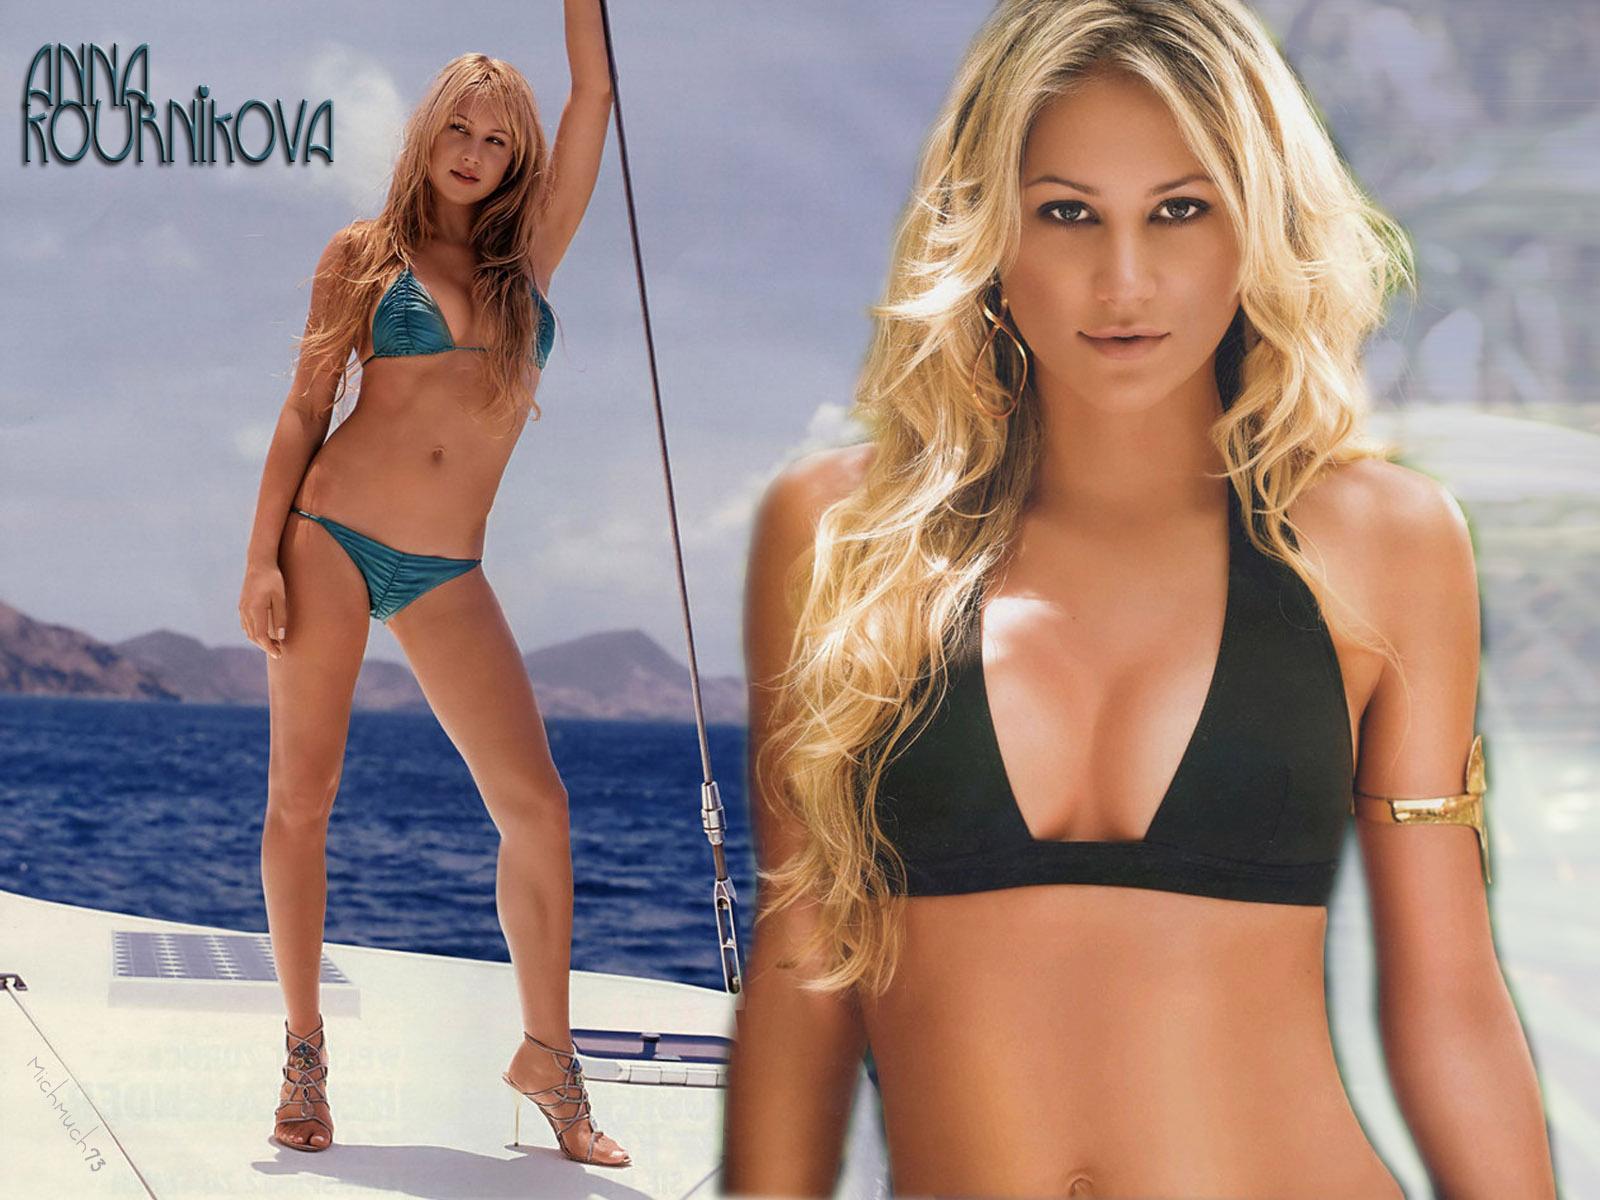 HD Wallpapers: Anna Kournikova Hot